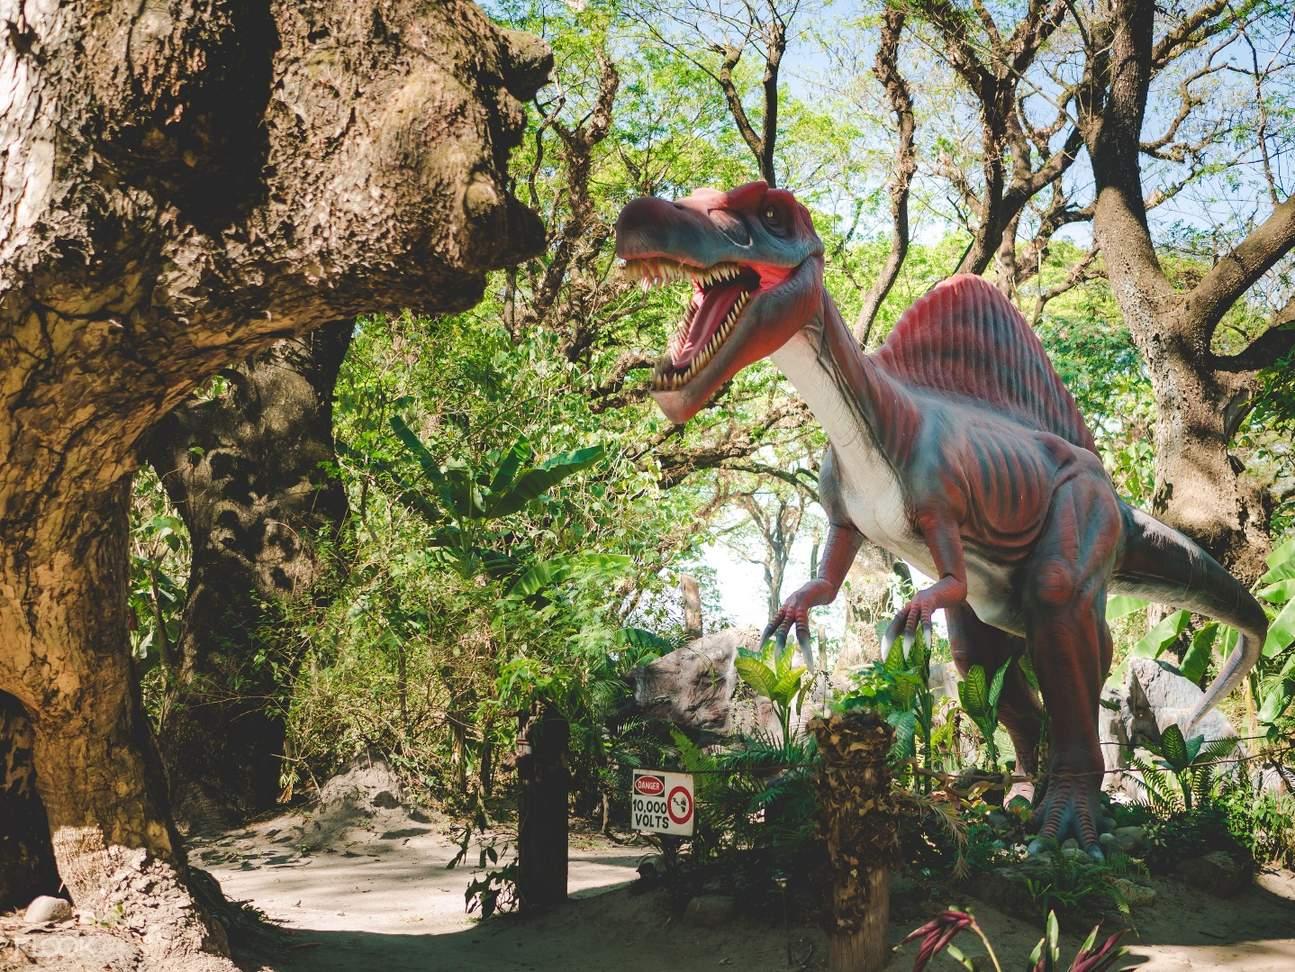 outdoor dinosaur stature in Dinosaurs Island Clark